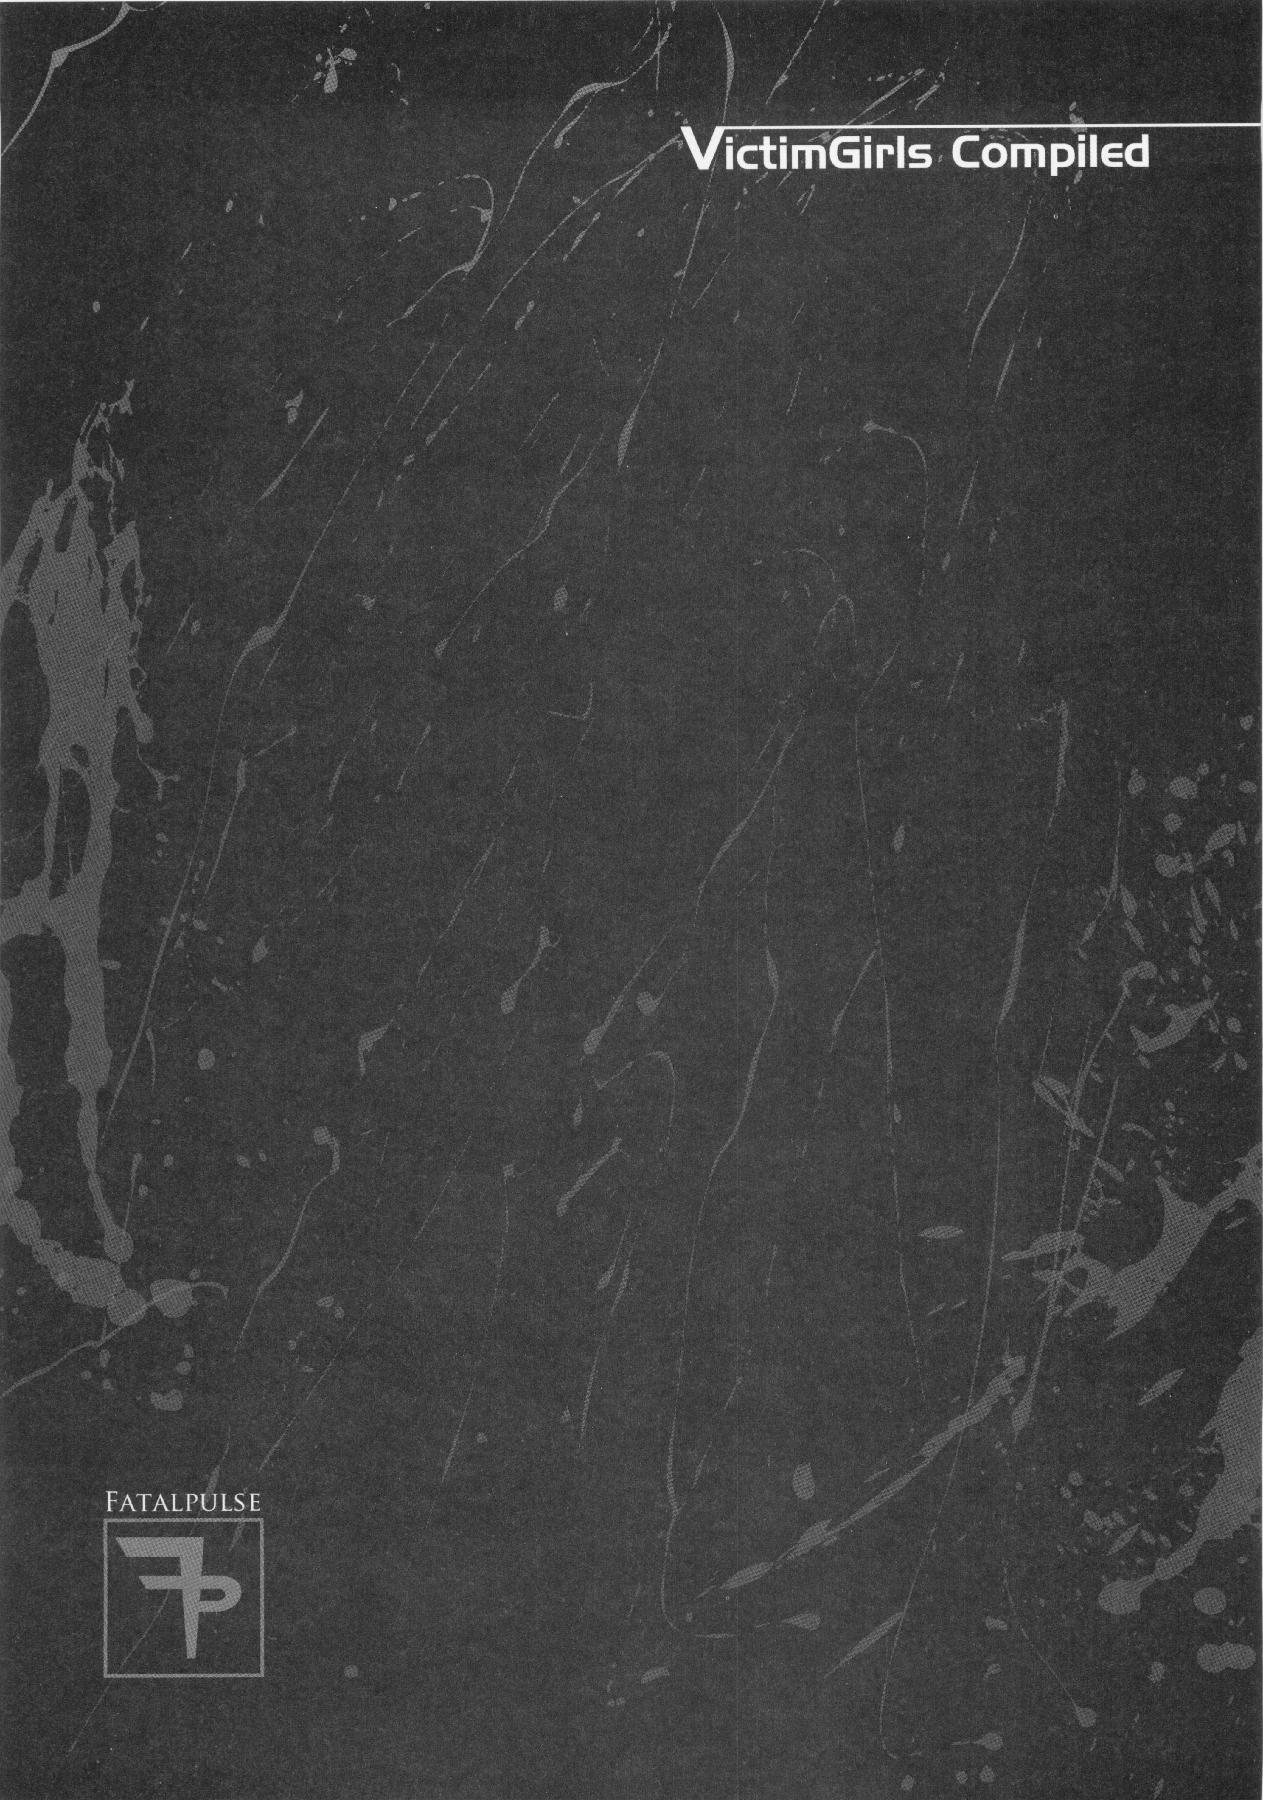 (C83) [Fatalpulse (Asanagi)] VictimGirls Compiled Vol.1 -Victimgirls Soushuuhen 1- MMO Game Selection (Various) 72